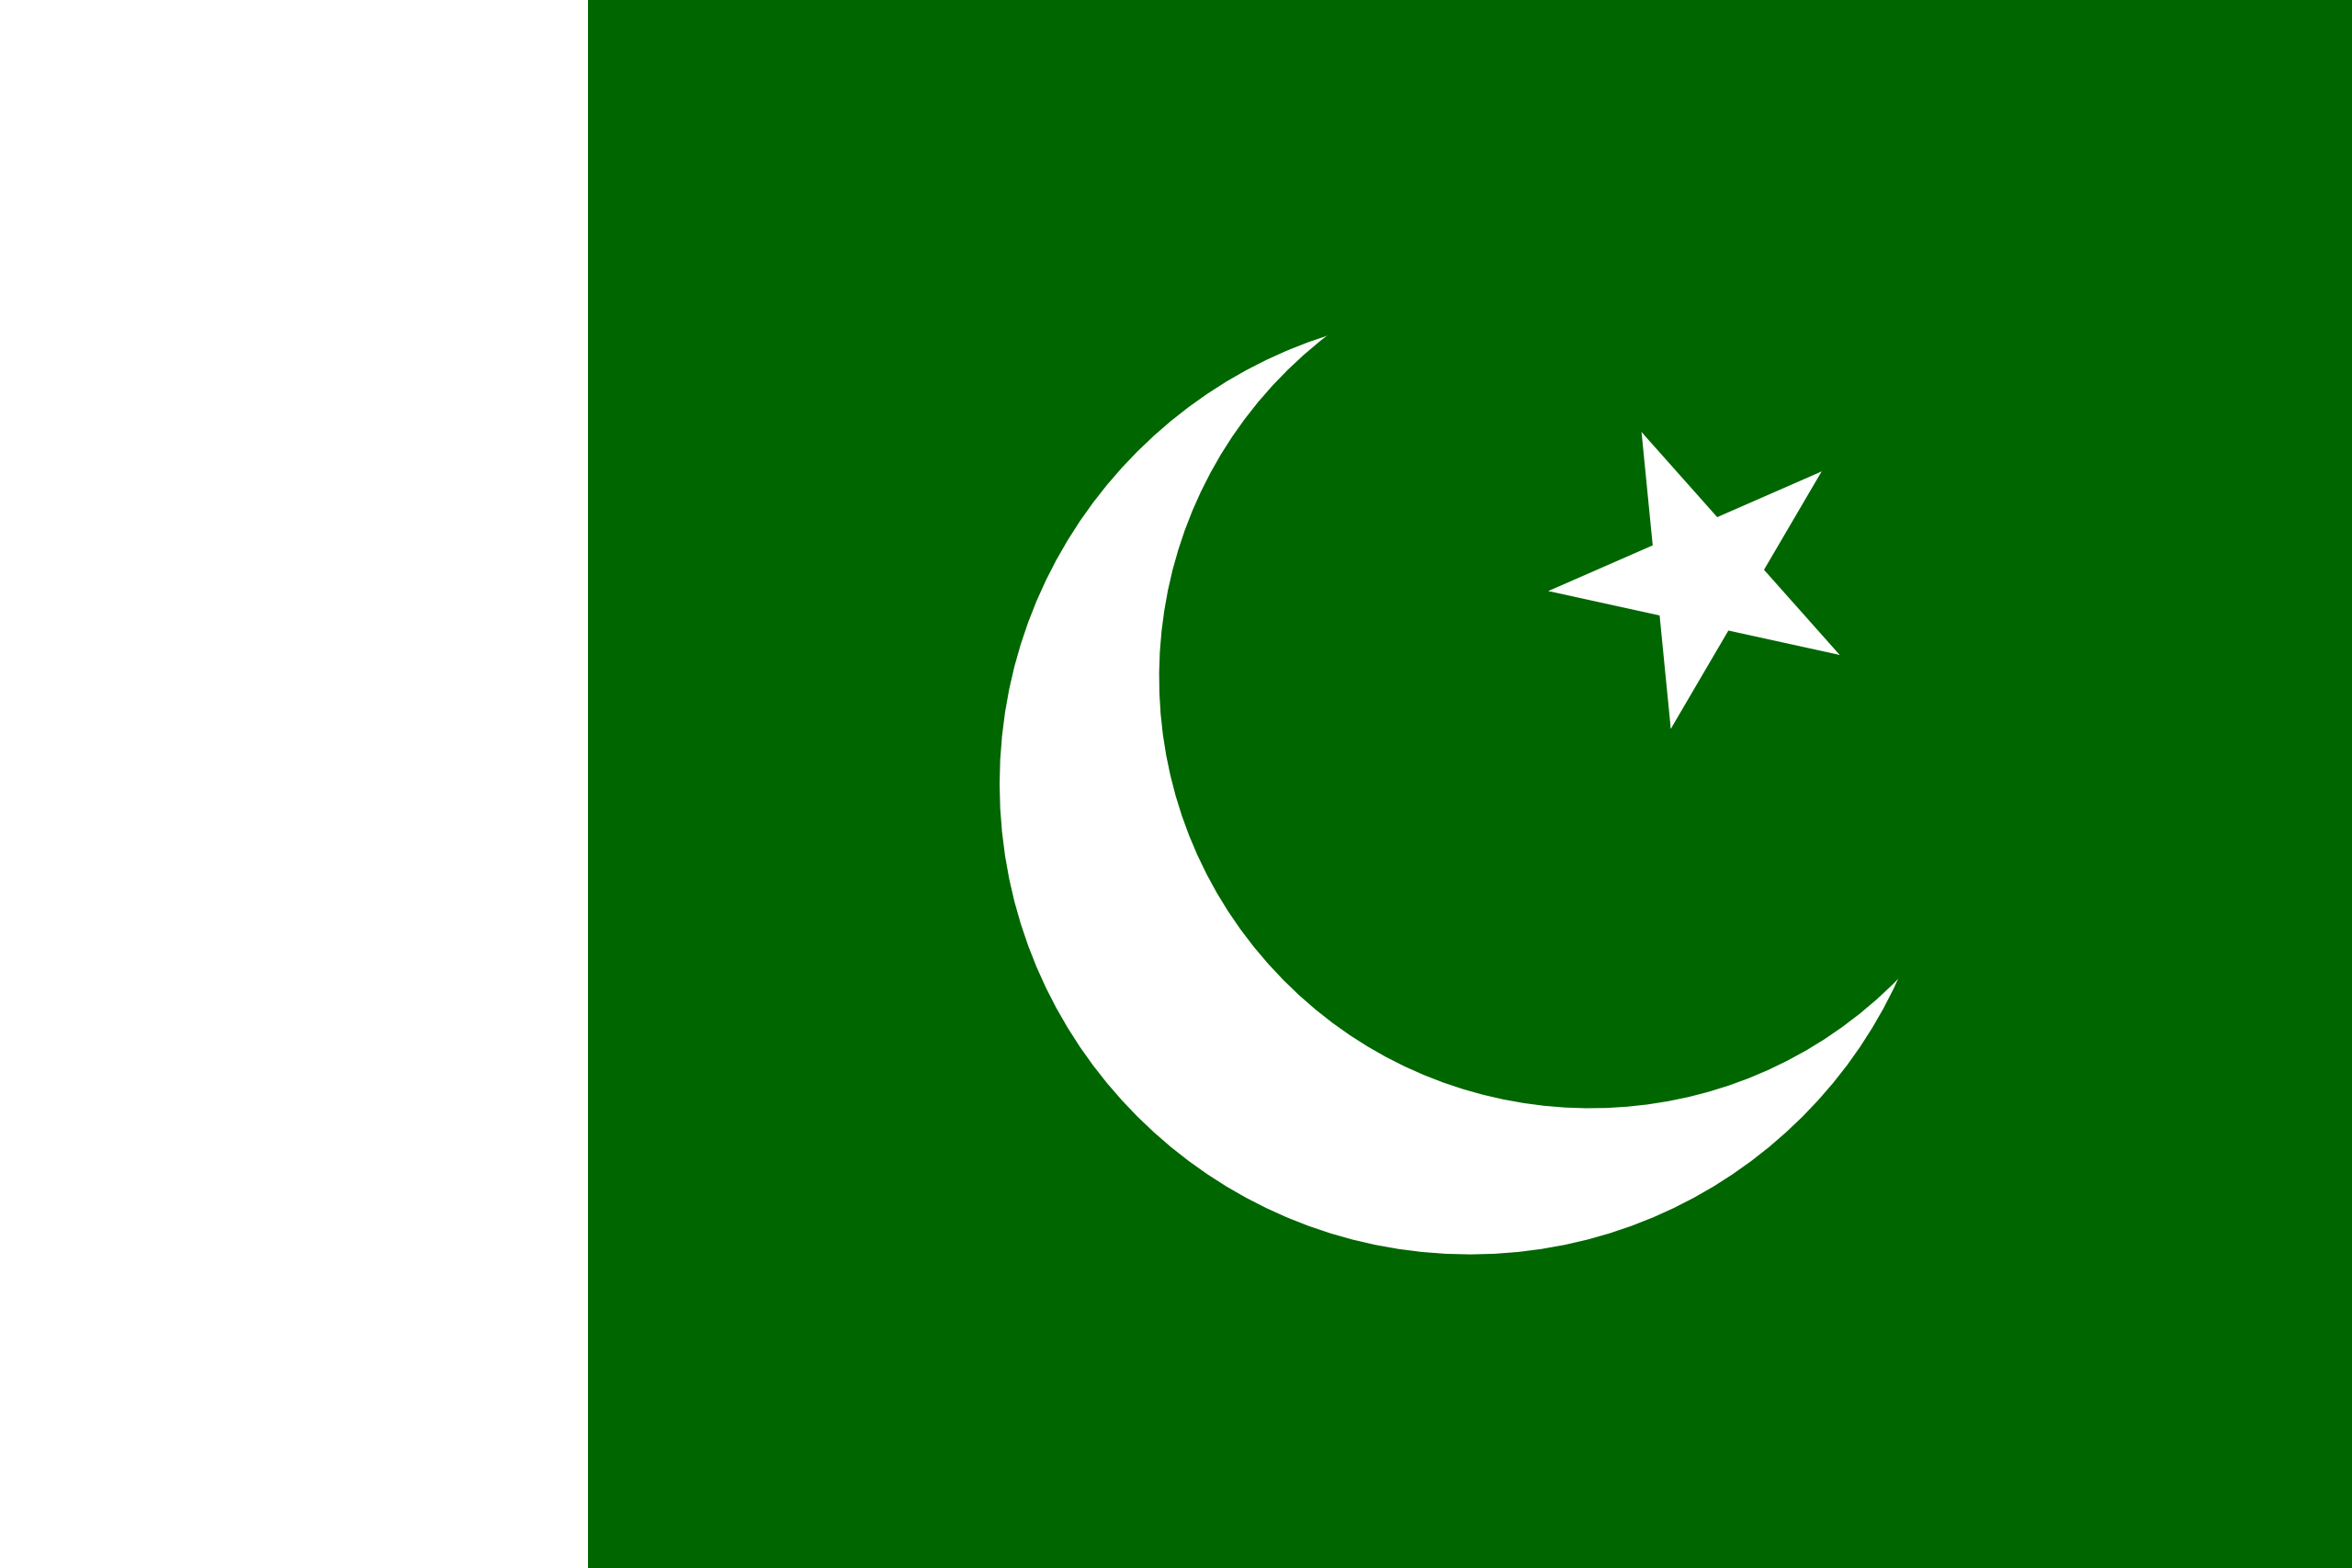 pakistán, 国, エンブレム, ロゴ, シンボル - HD の壁紙 - 教授-falken.com